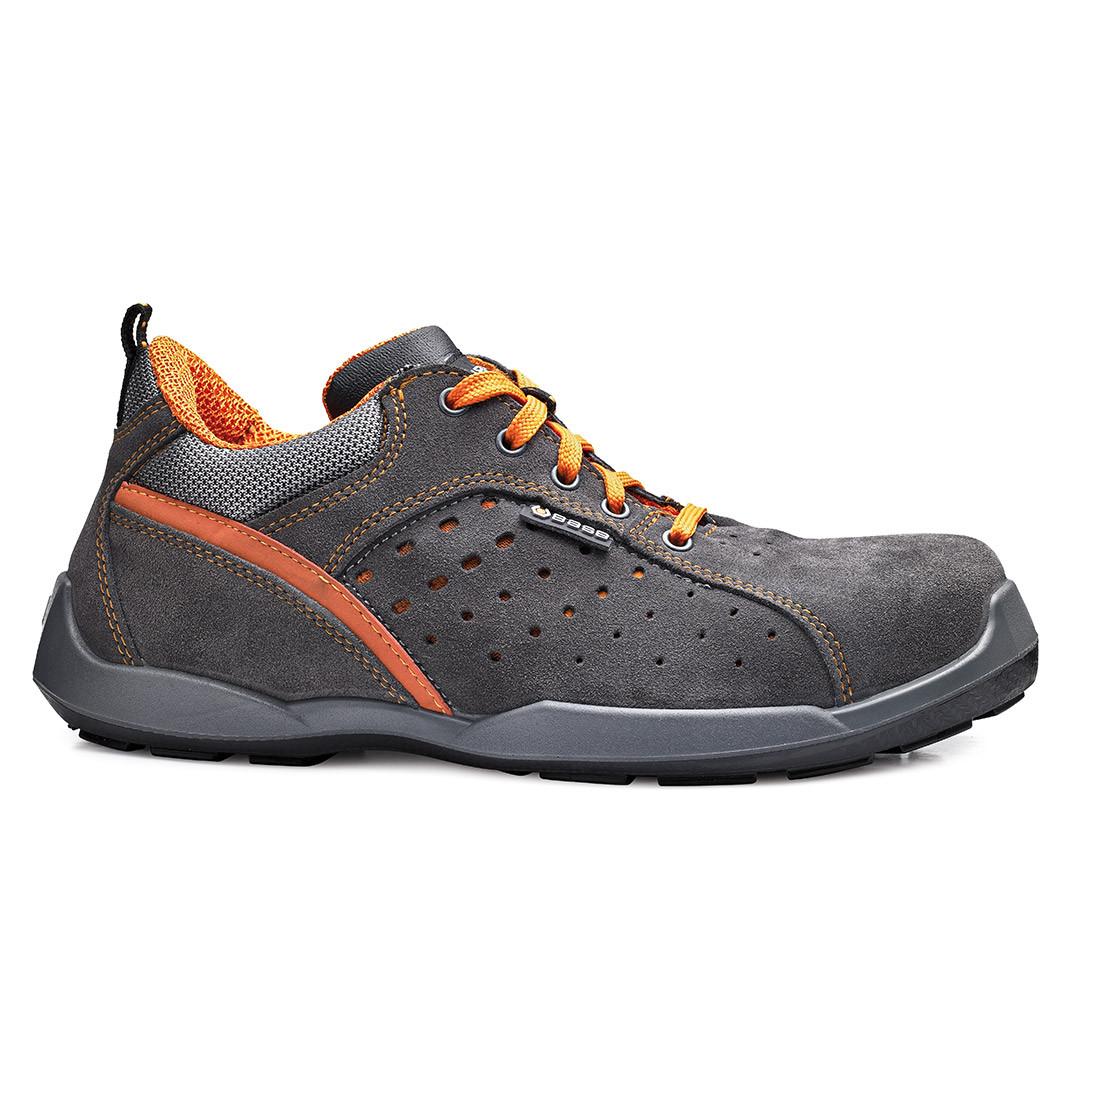 Pantofi Climb S1P SRC - Incaltaminte de protectie